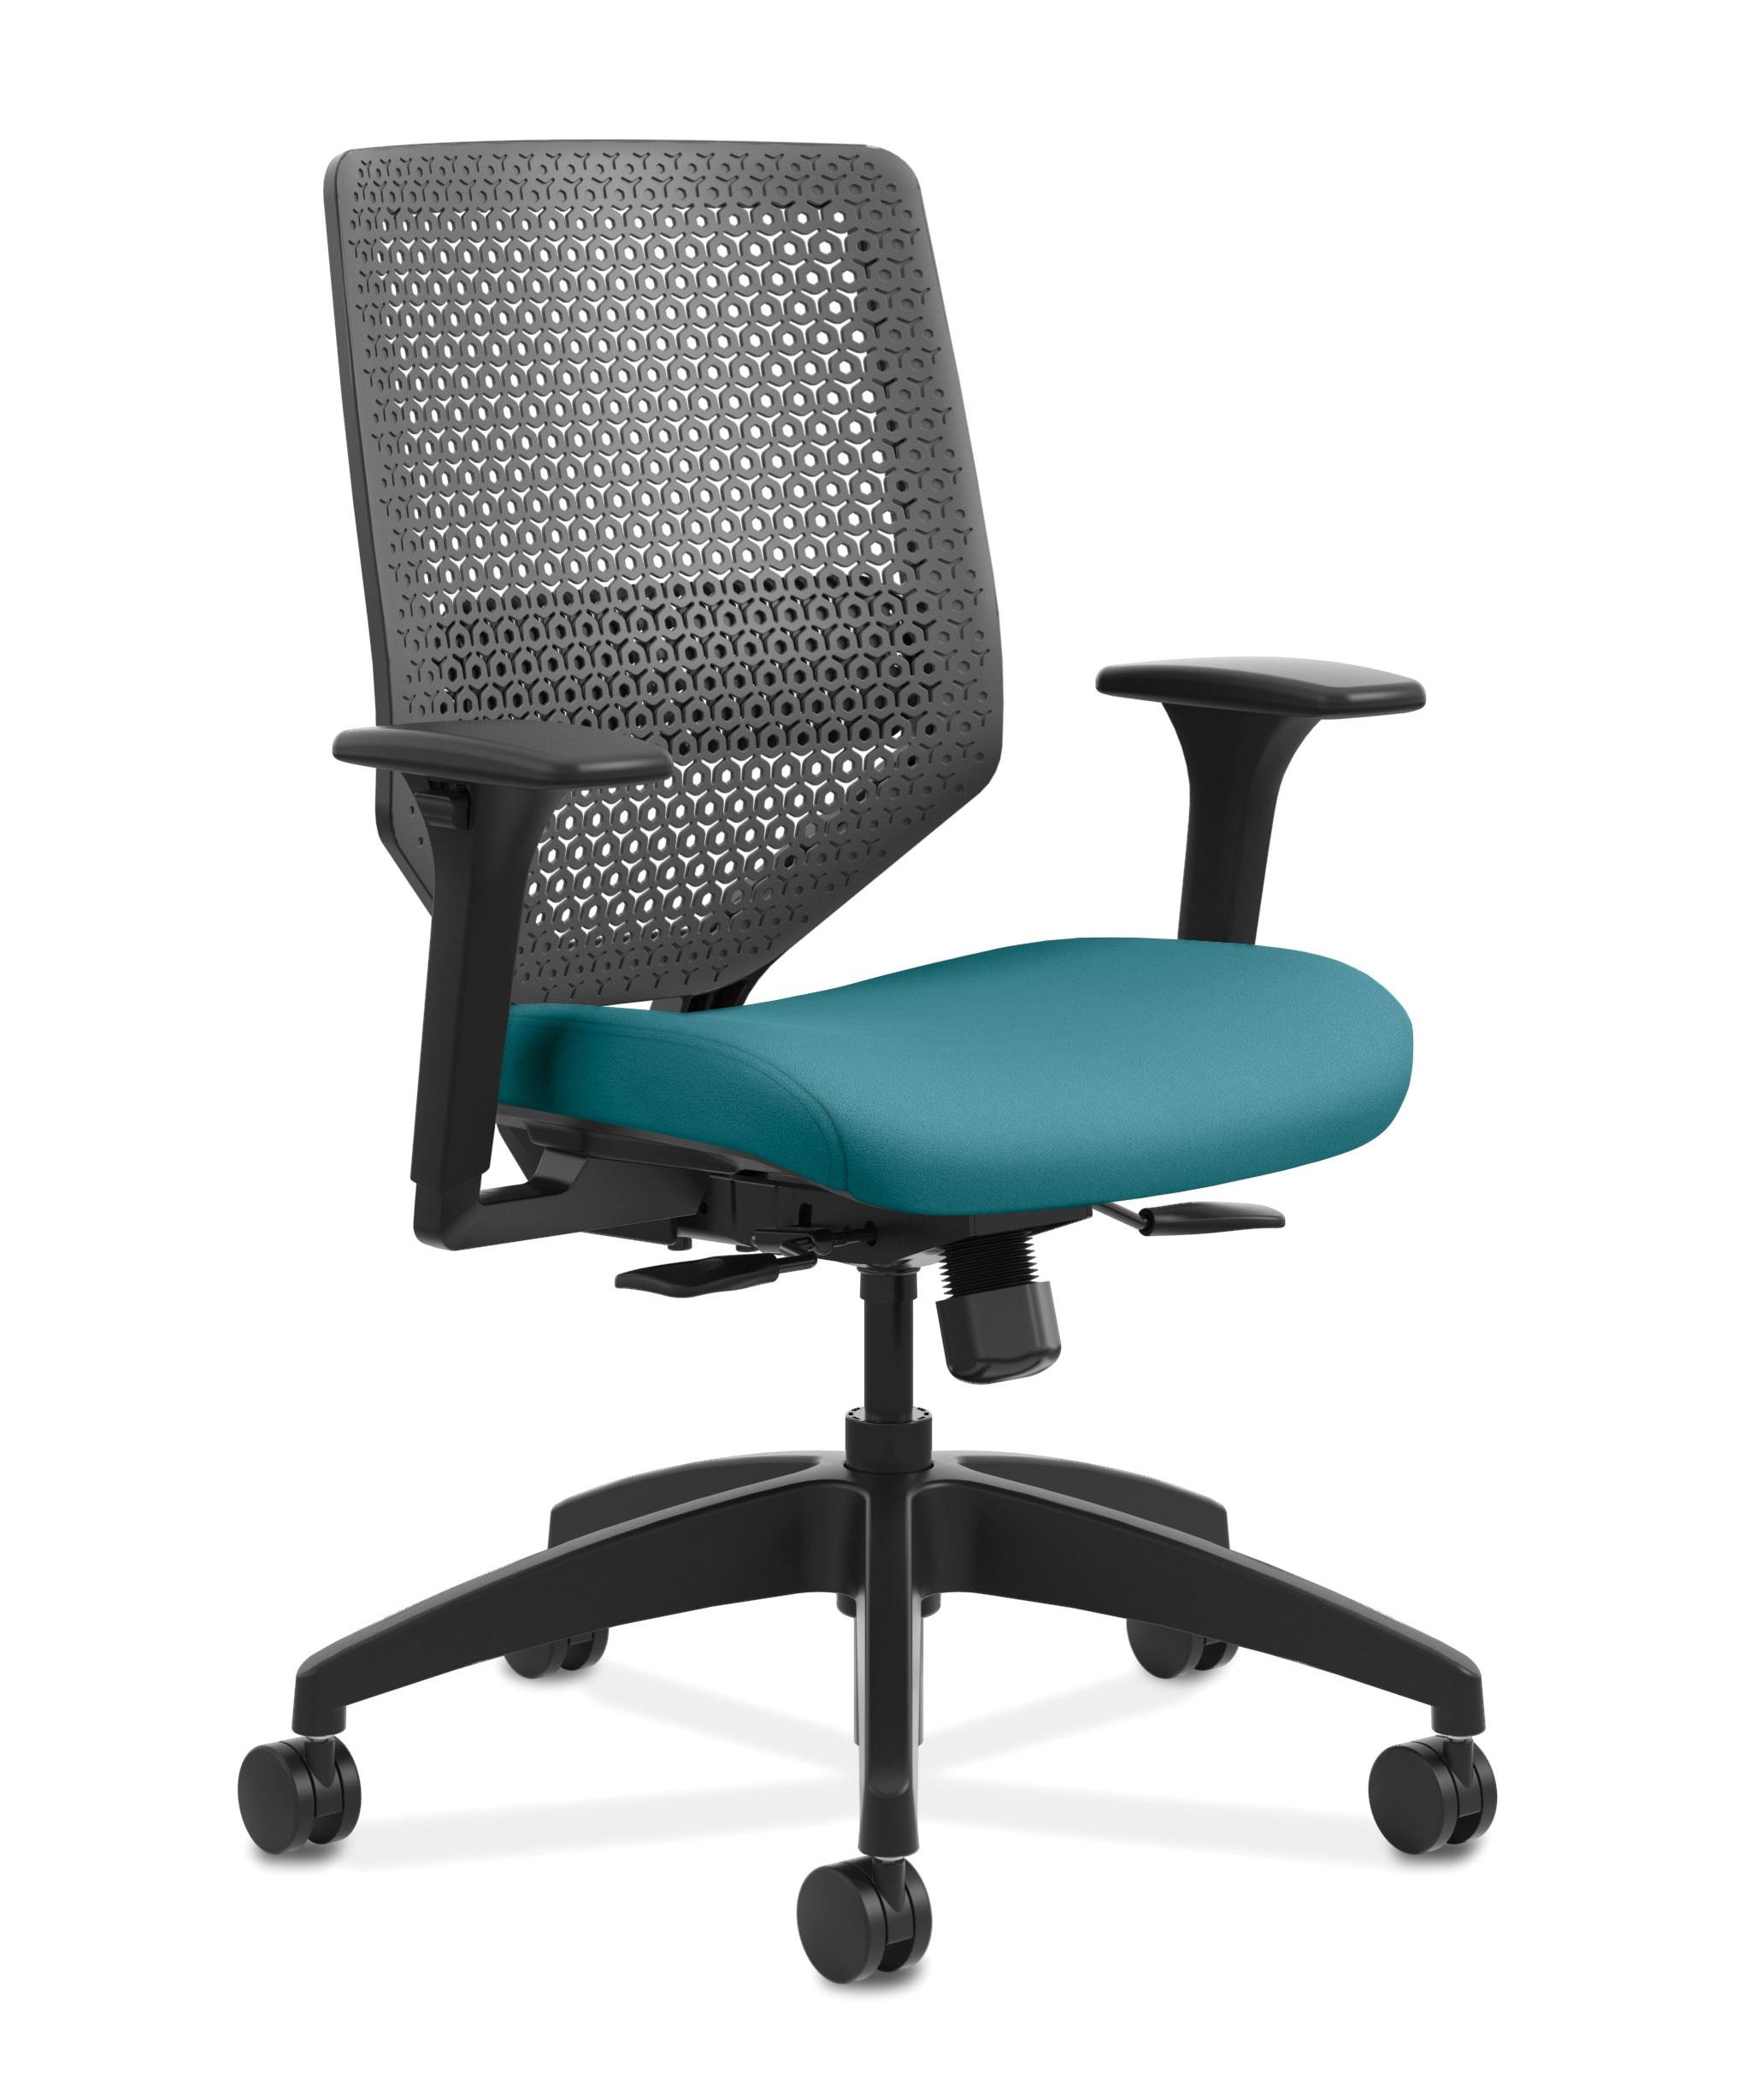 Work Chair- HN Solve